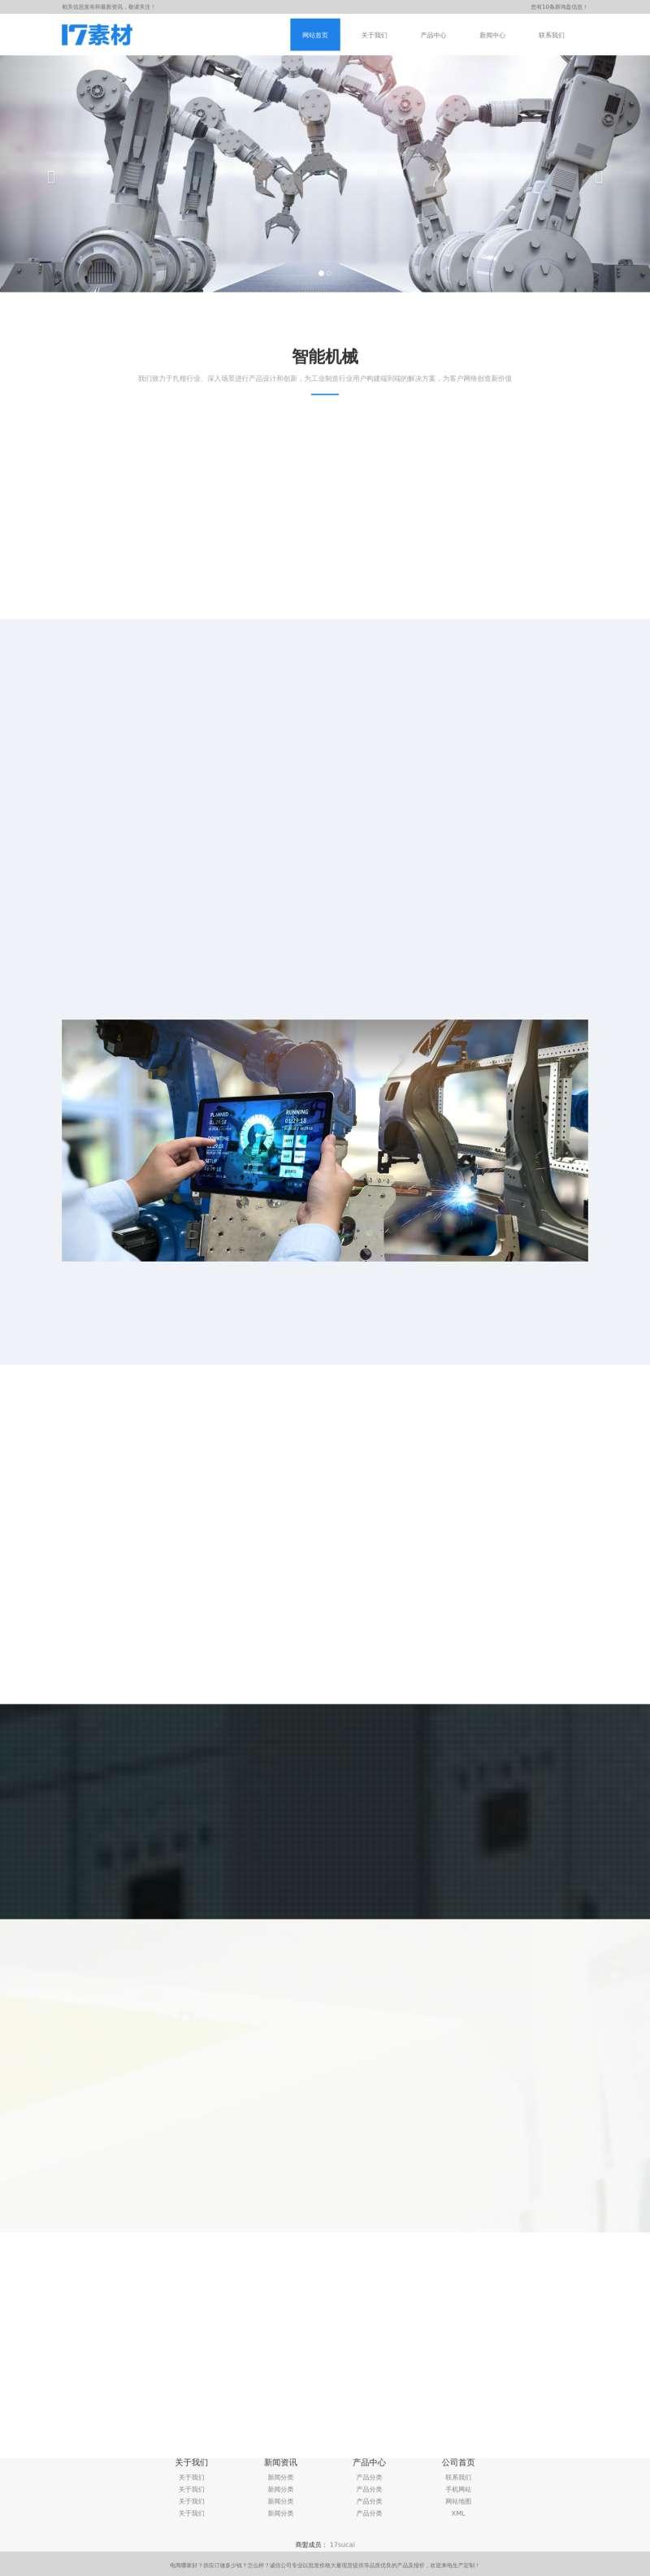 bootstrap智能机械化公司网站模板